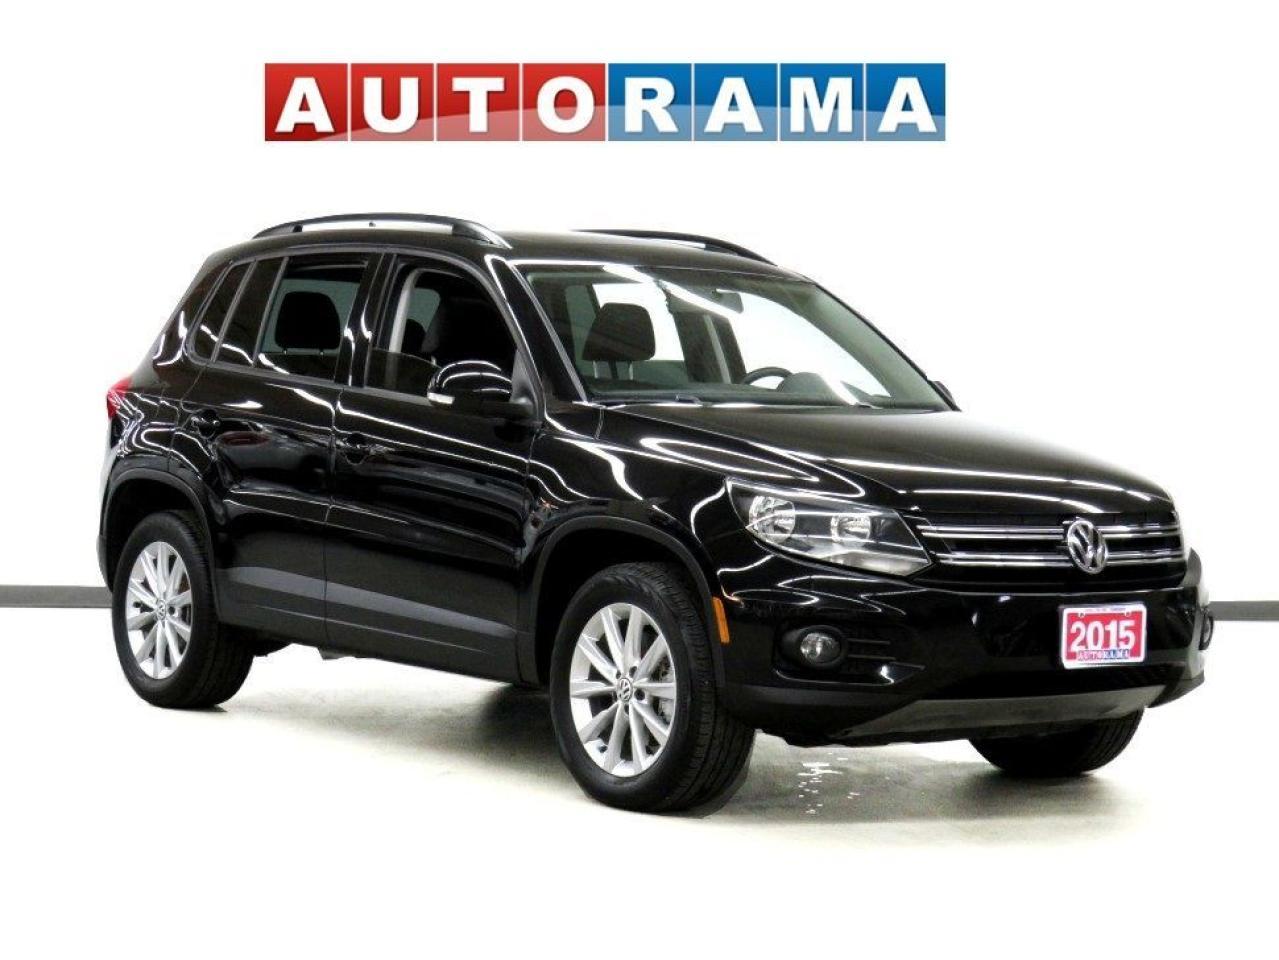 2015 Volkswagen Tiguan COMFORTLINE LEATHER PANORAMIC SUNROOF AWD